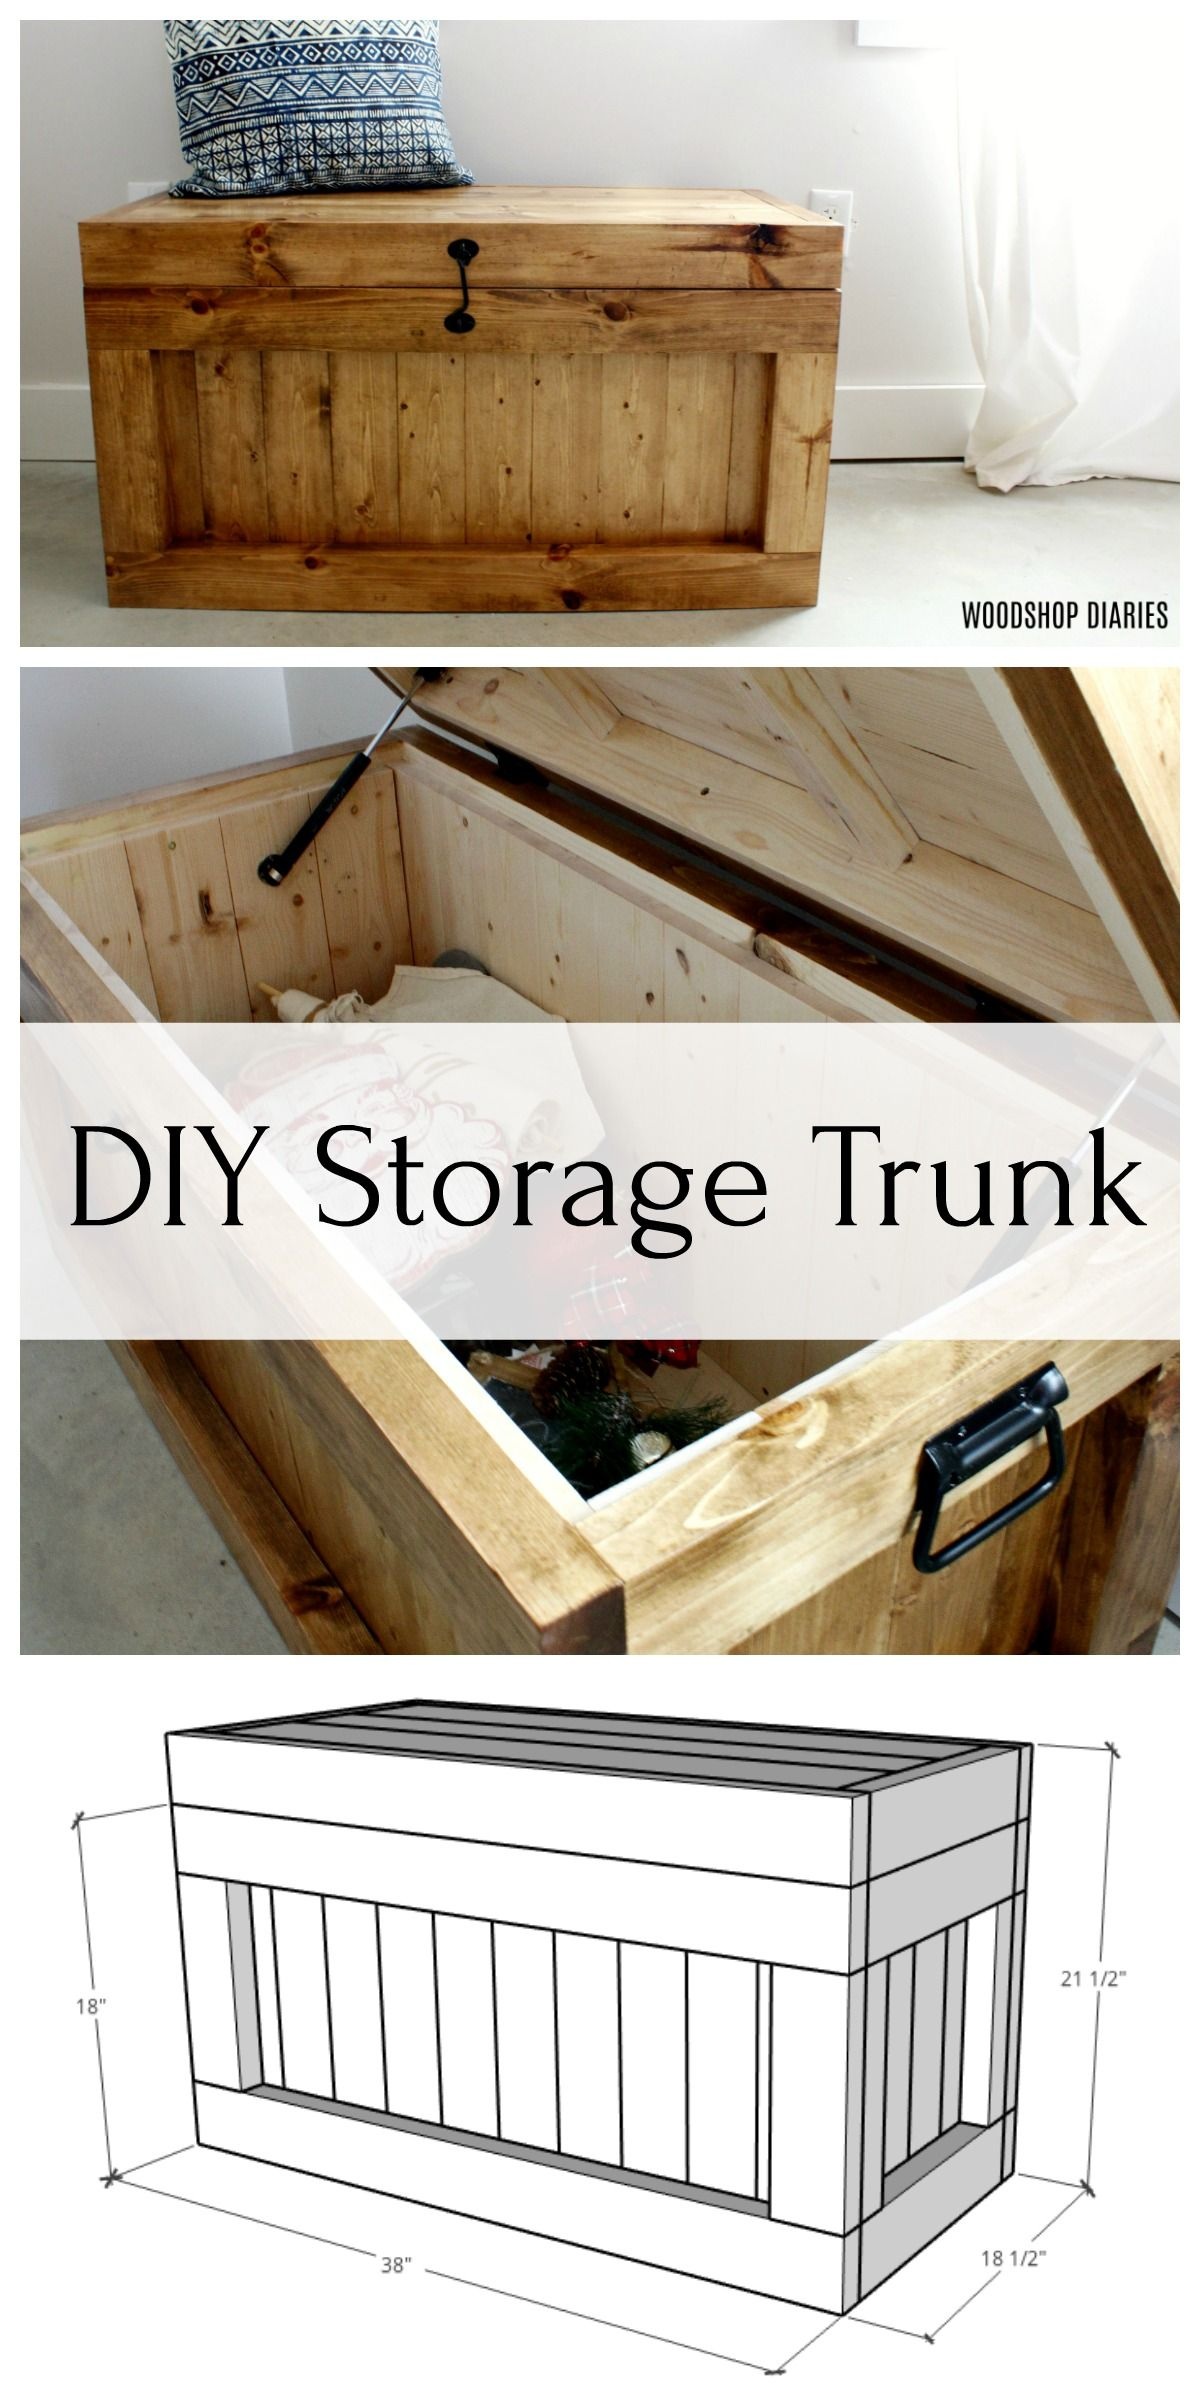 DIY Storage Trunk–FREE PLANS!